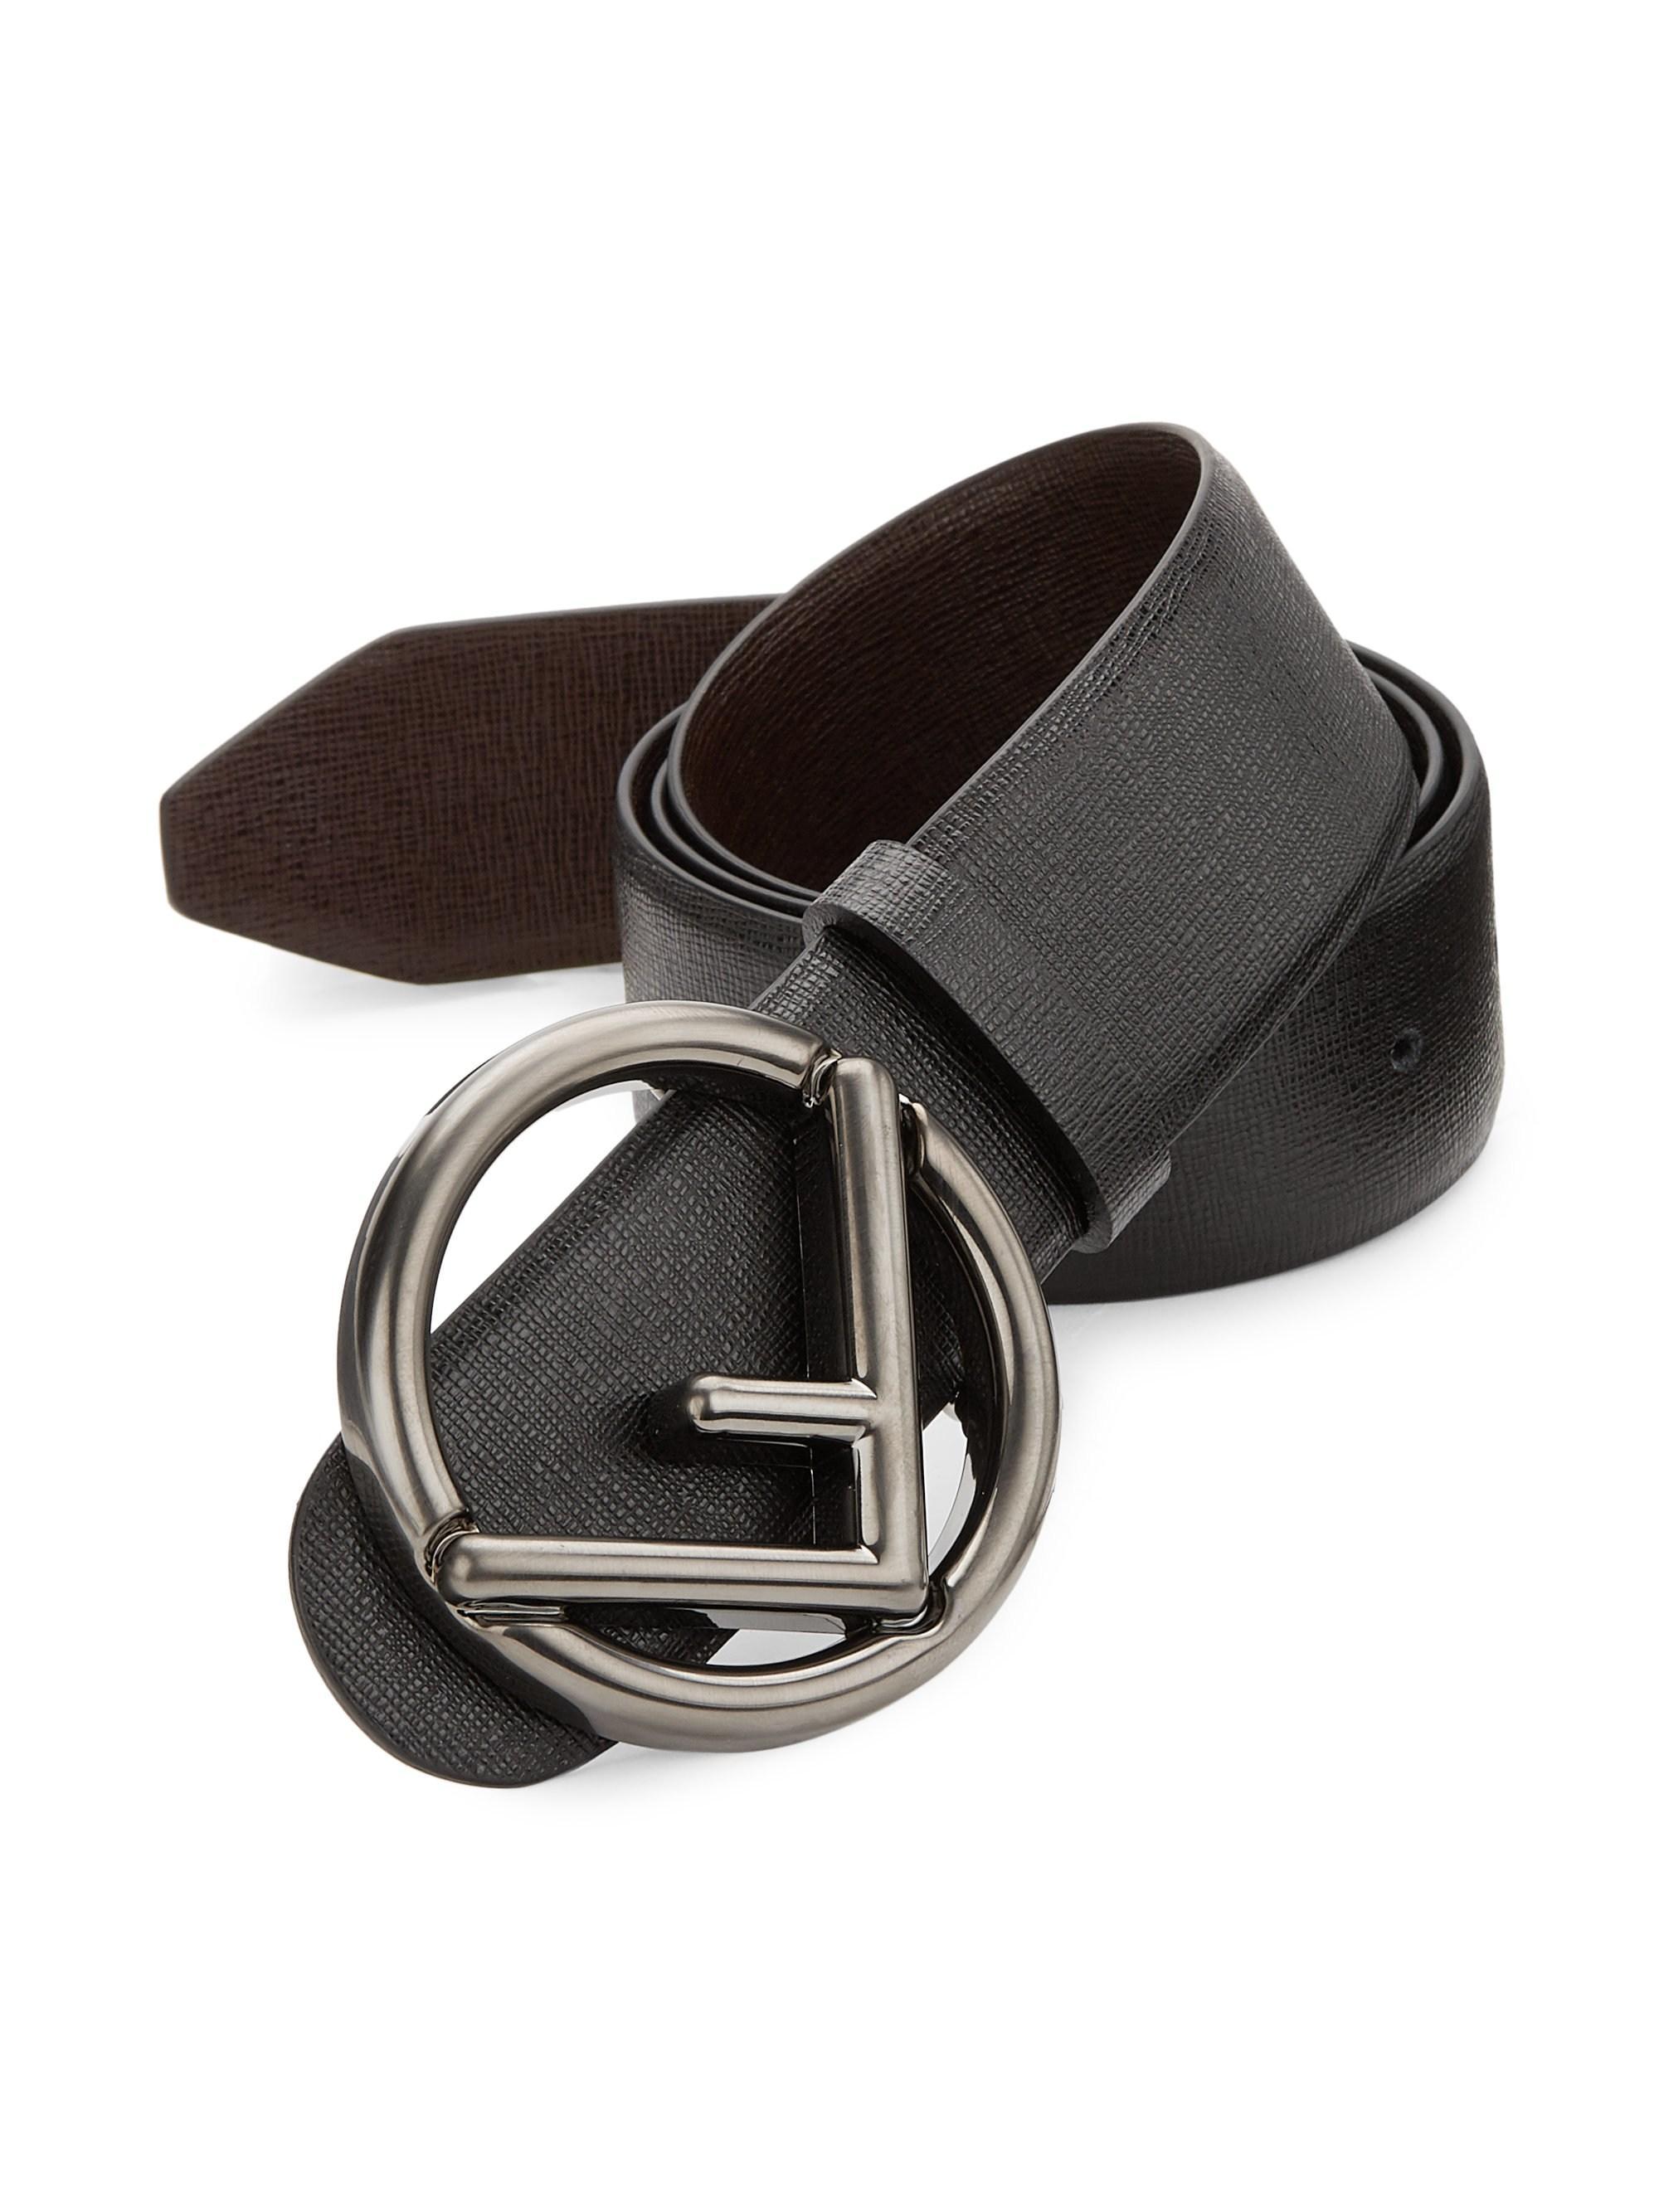 7d3db13df7 Fendi Multicolor Men's Forever Logo Reversible Leather Belt - Black Brown -  Size 95 (38) for men